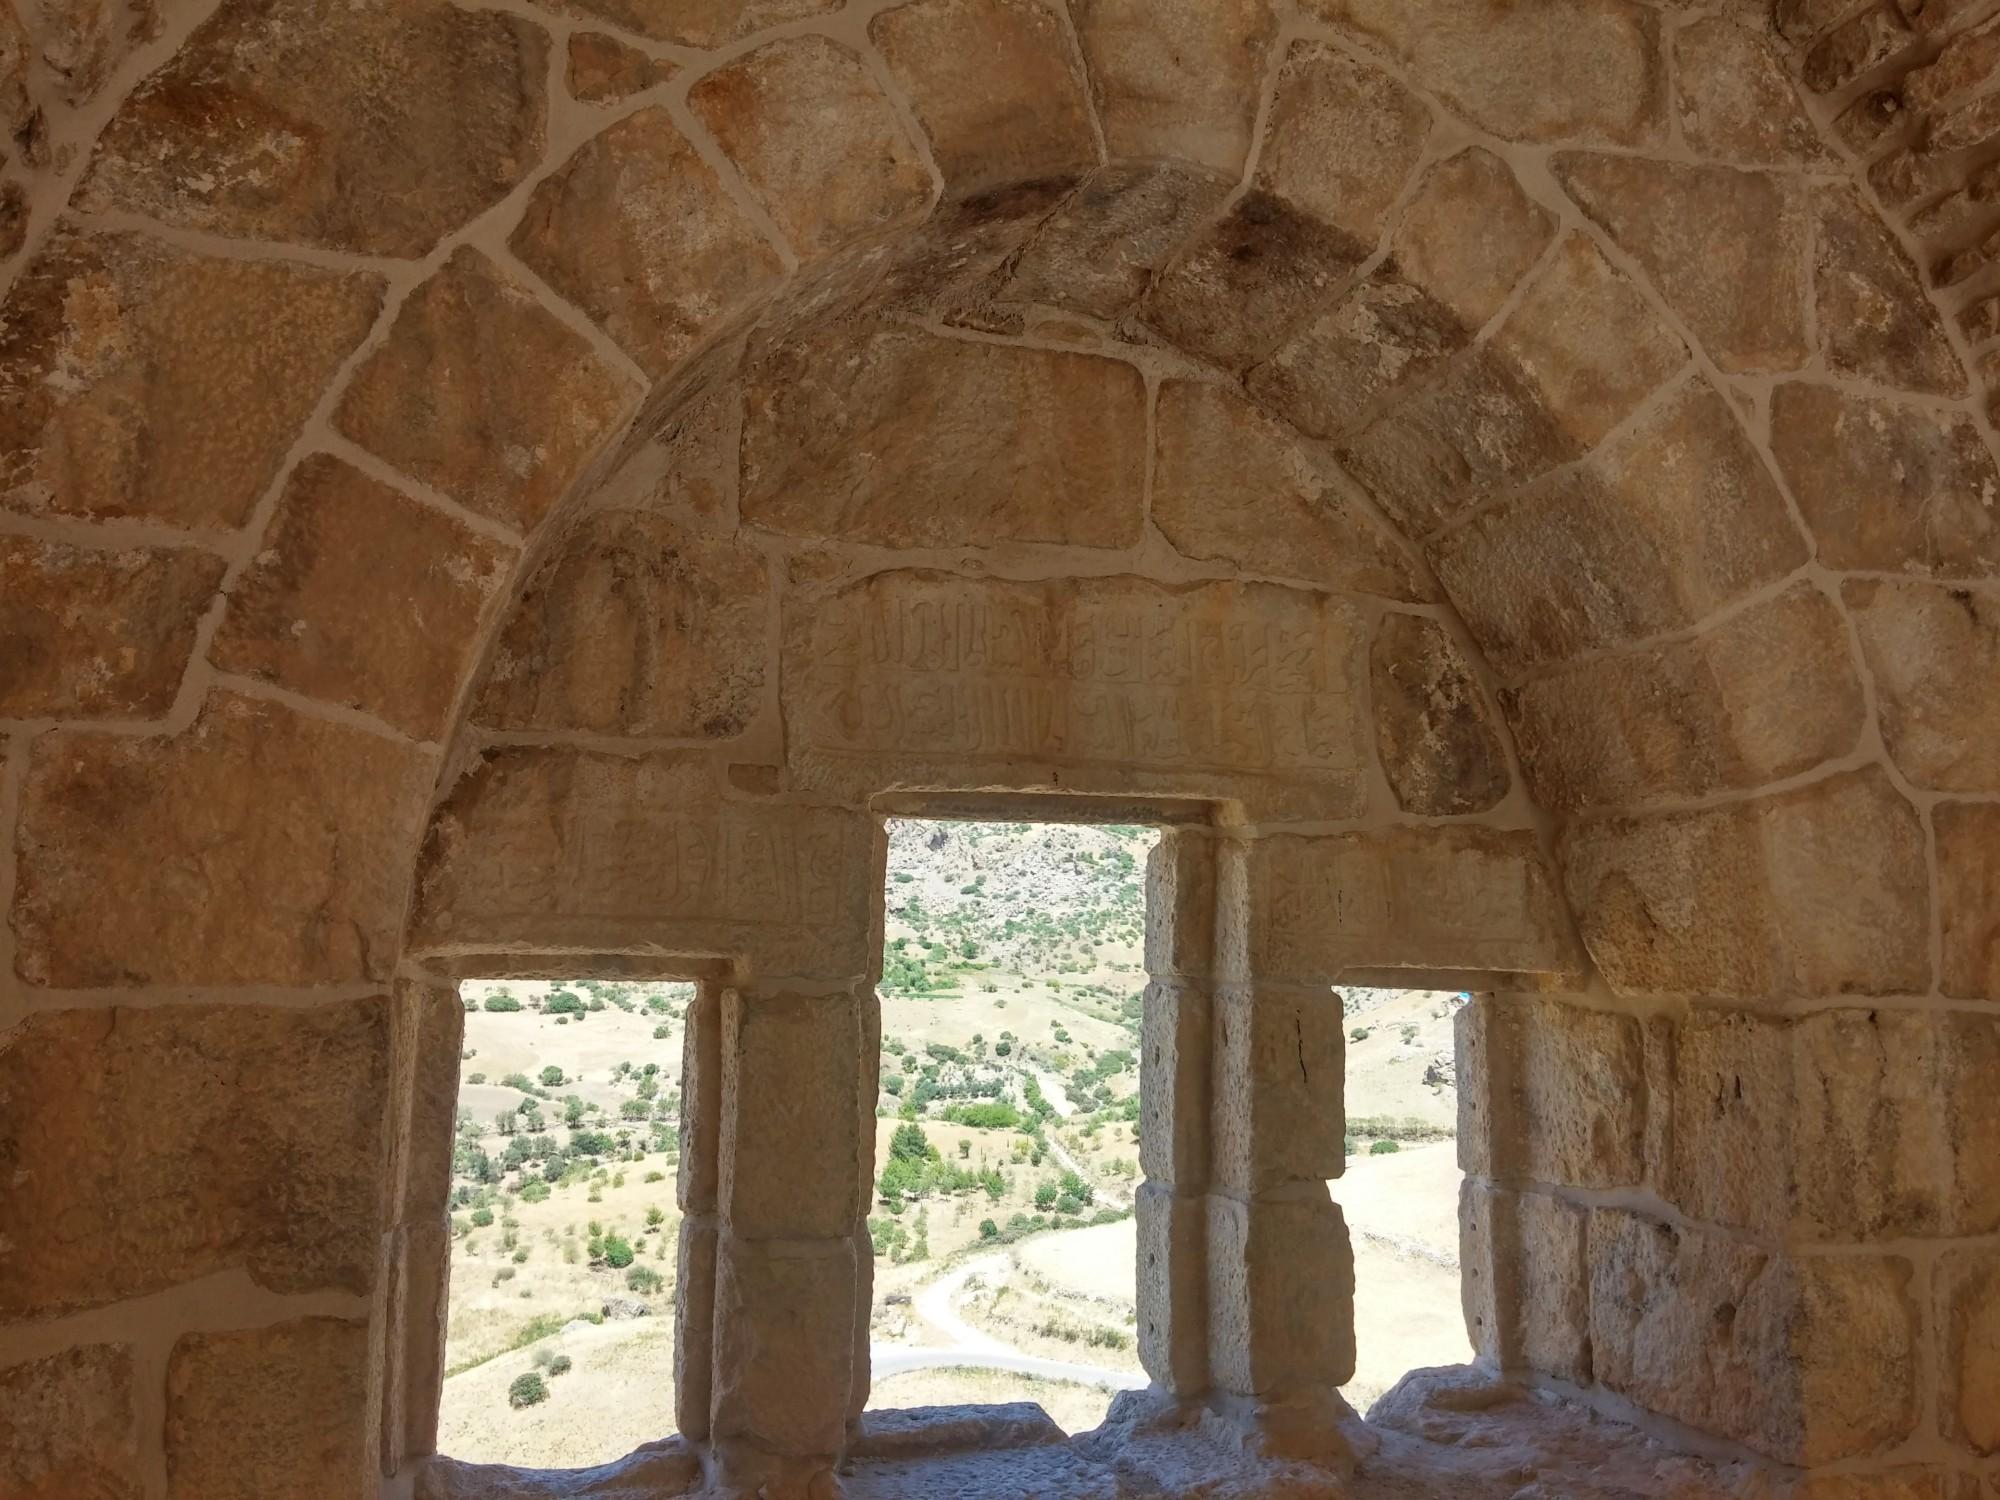 Yeni Kale Fortress in Eski Kahta